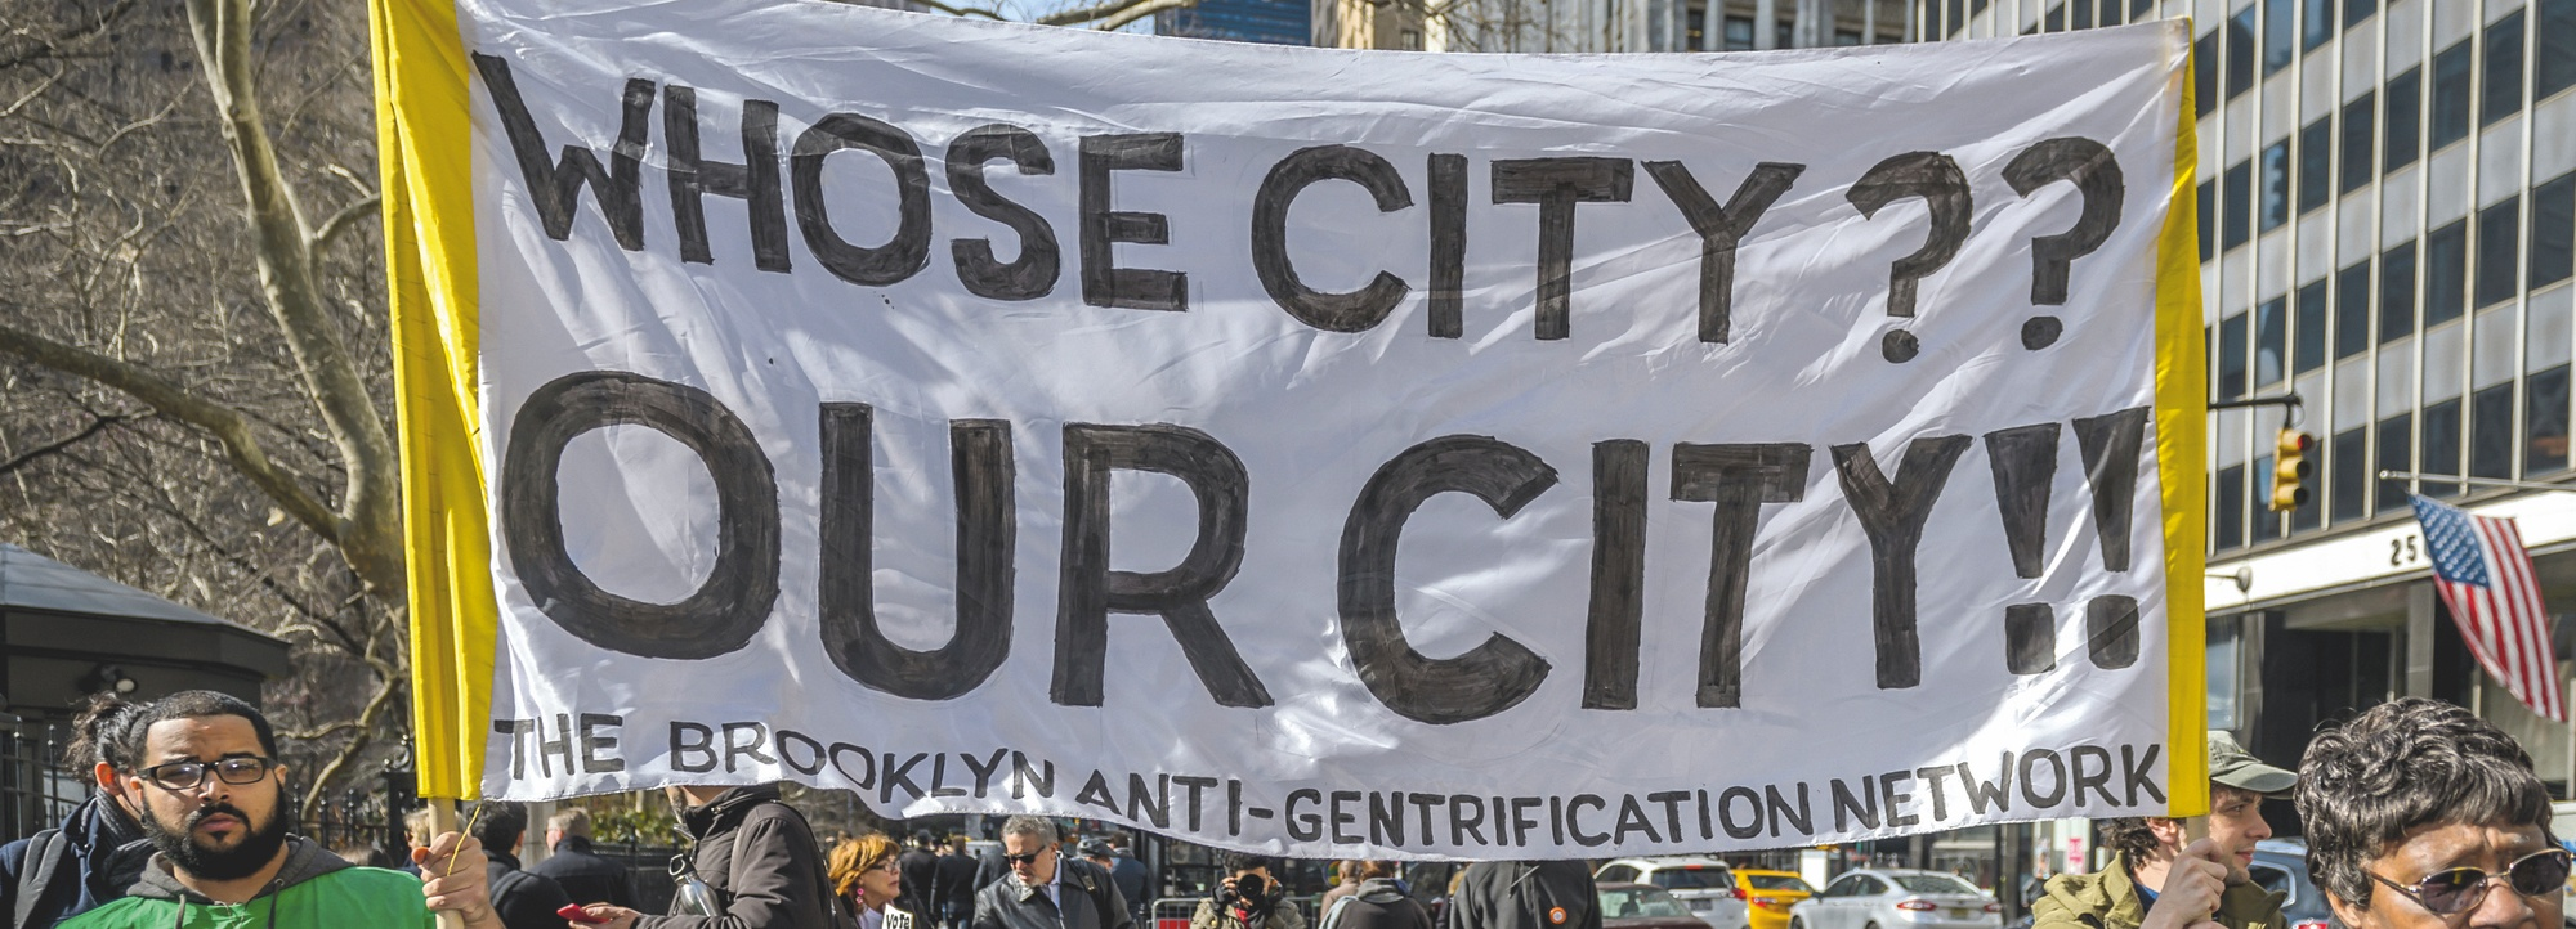 Manifestation contre la gentrification à Brooklyn (New York)